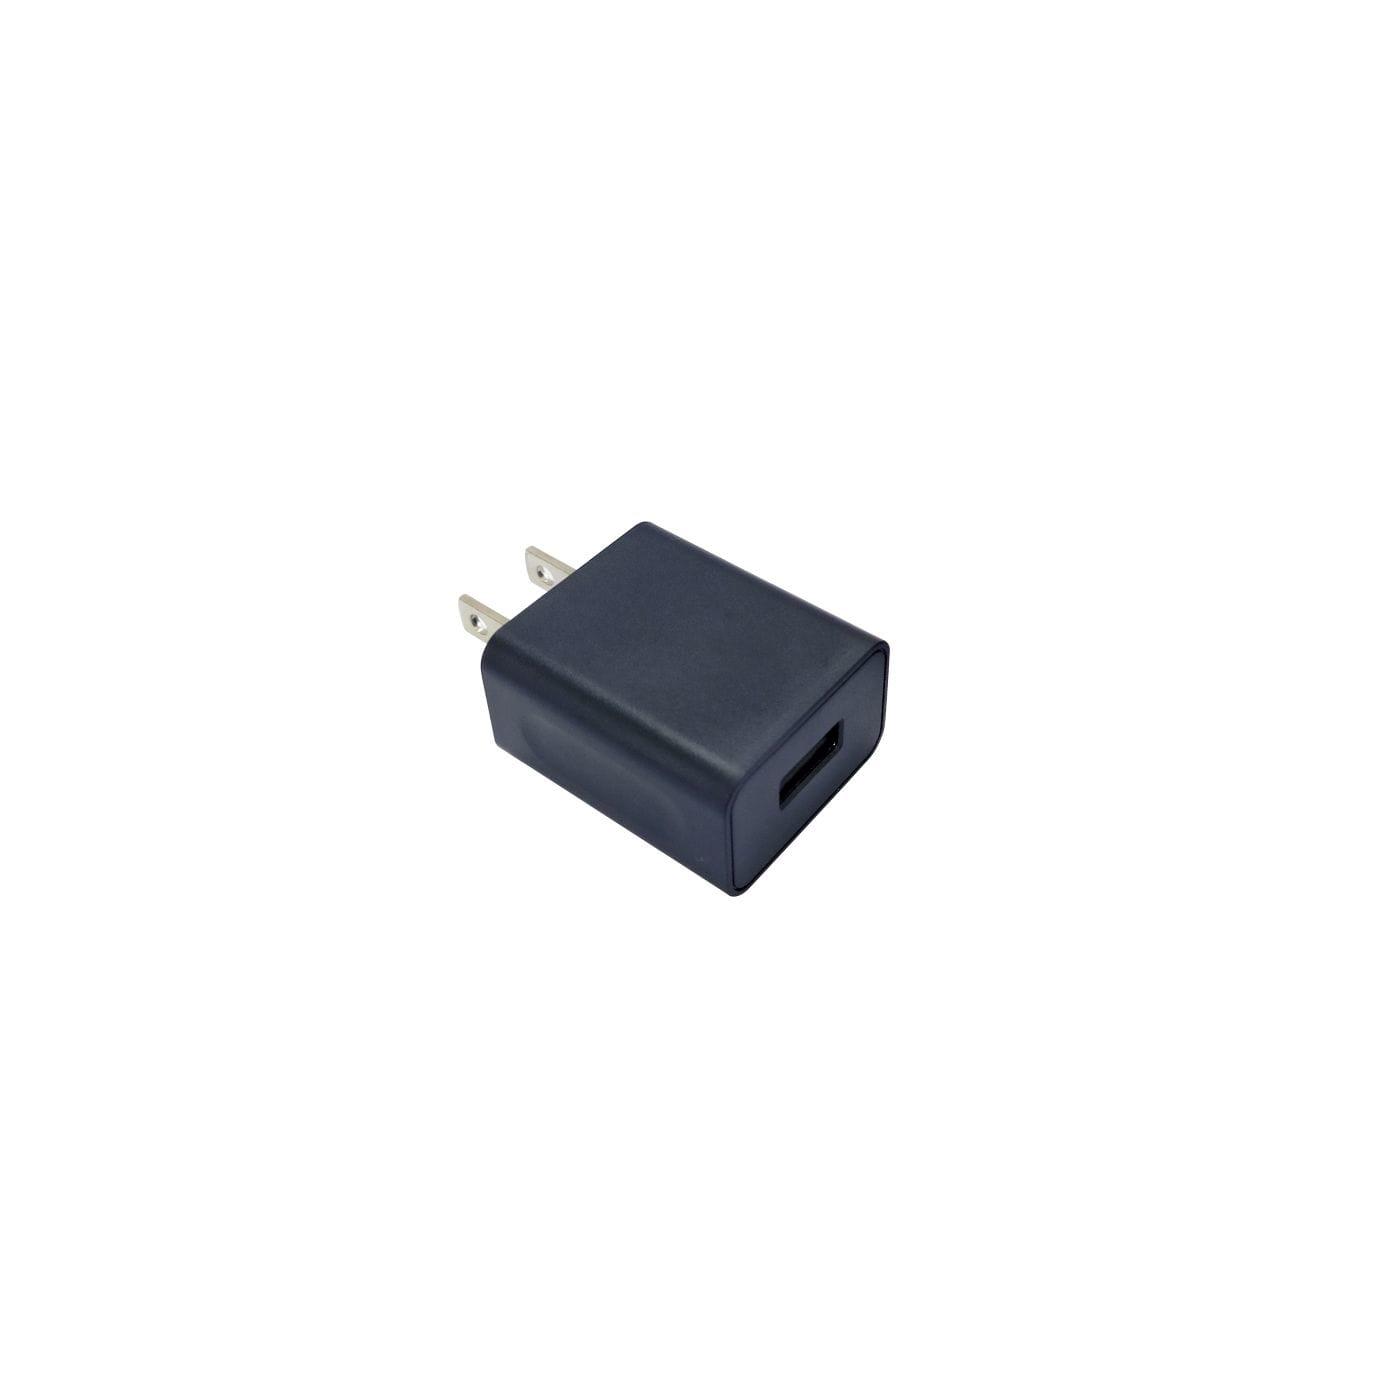 Protop USB Charging Adapter